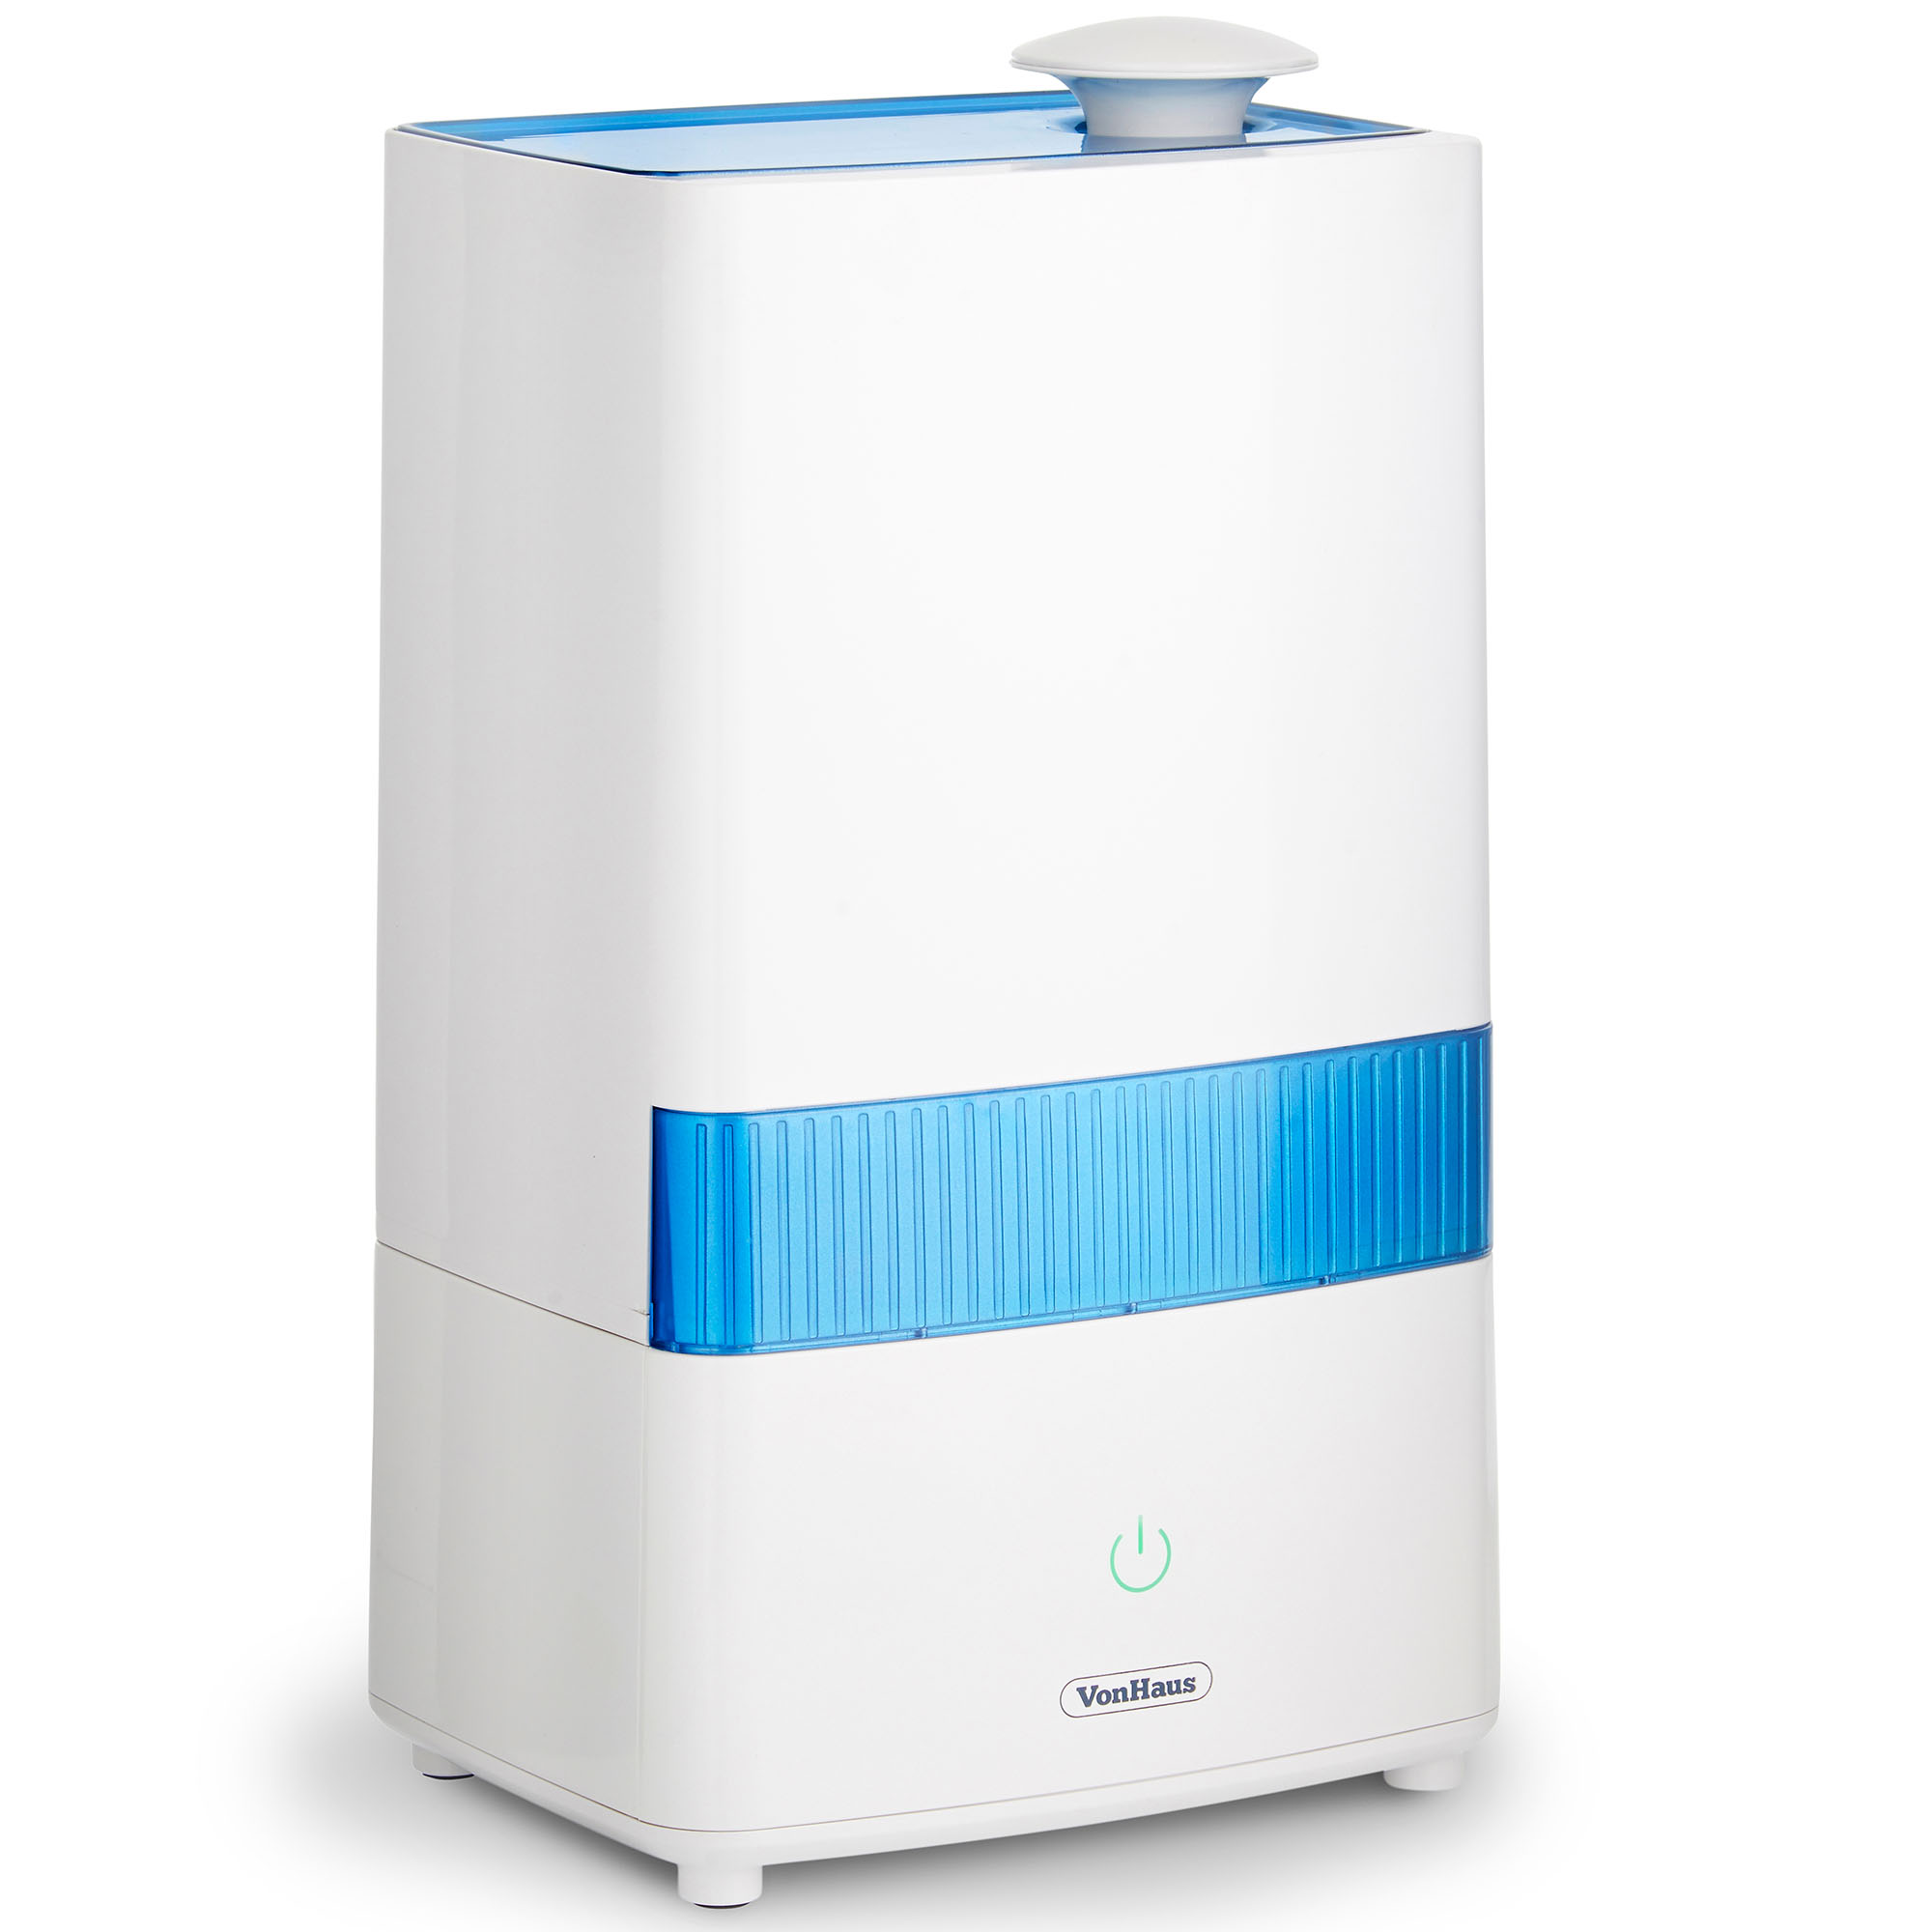 Vonhaus 4 5l ultrasonic humidifier aroma diffuser compact air moisturiser 5056115707216 ebay - Humidifier l air naturellement ...